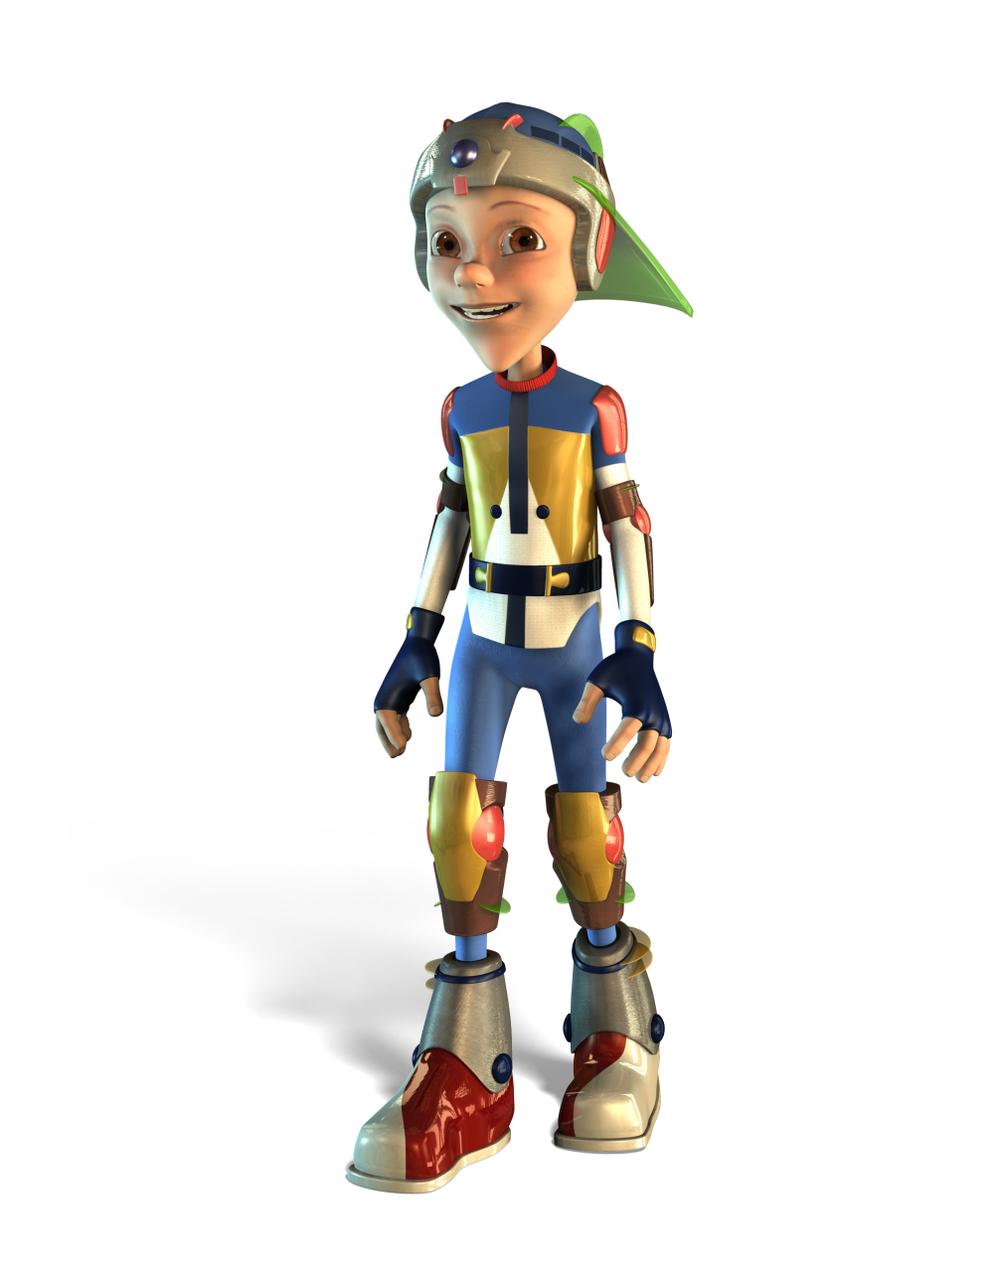 Character Design Zach : Pinocchio characters — danielrobichaud